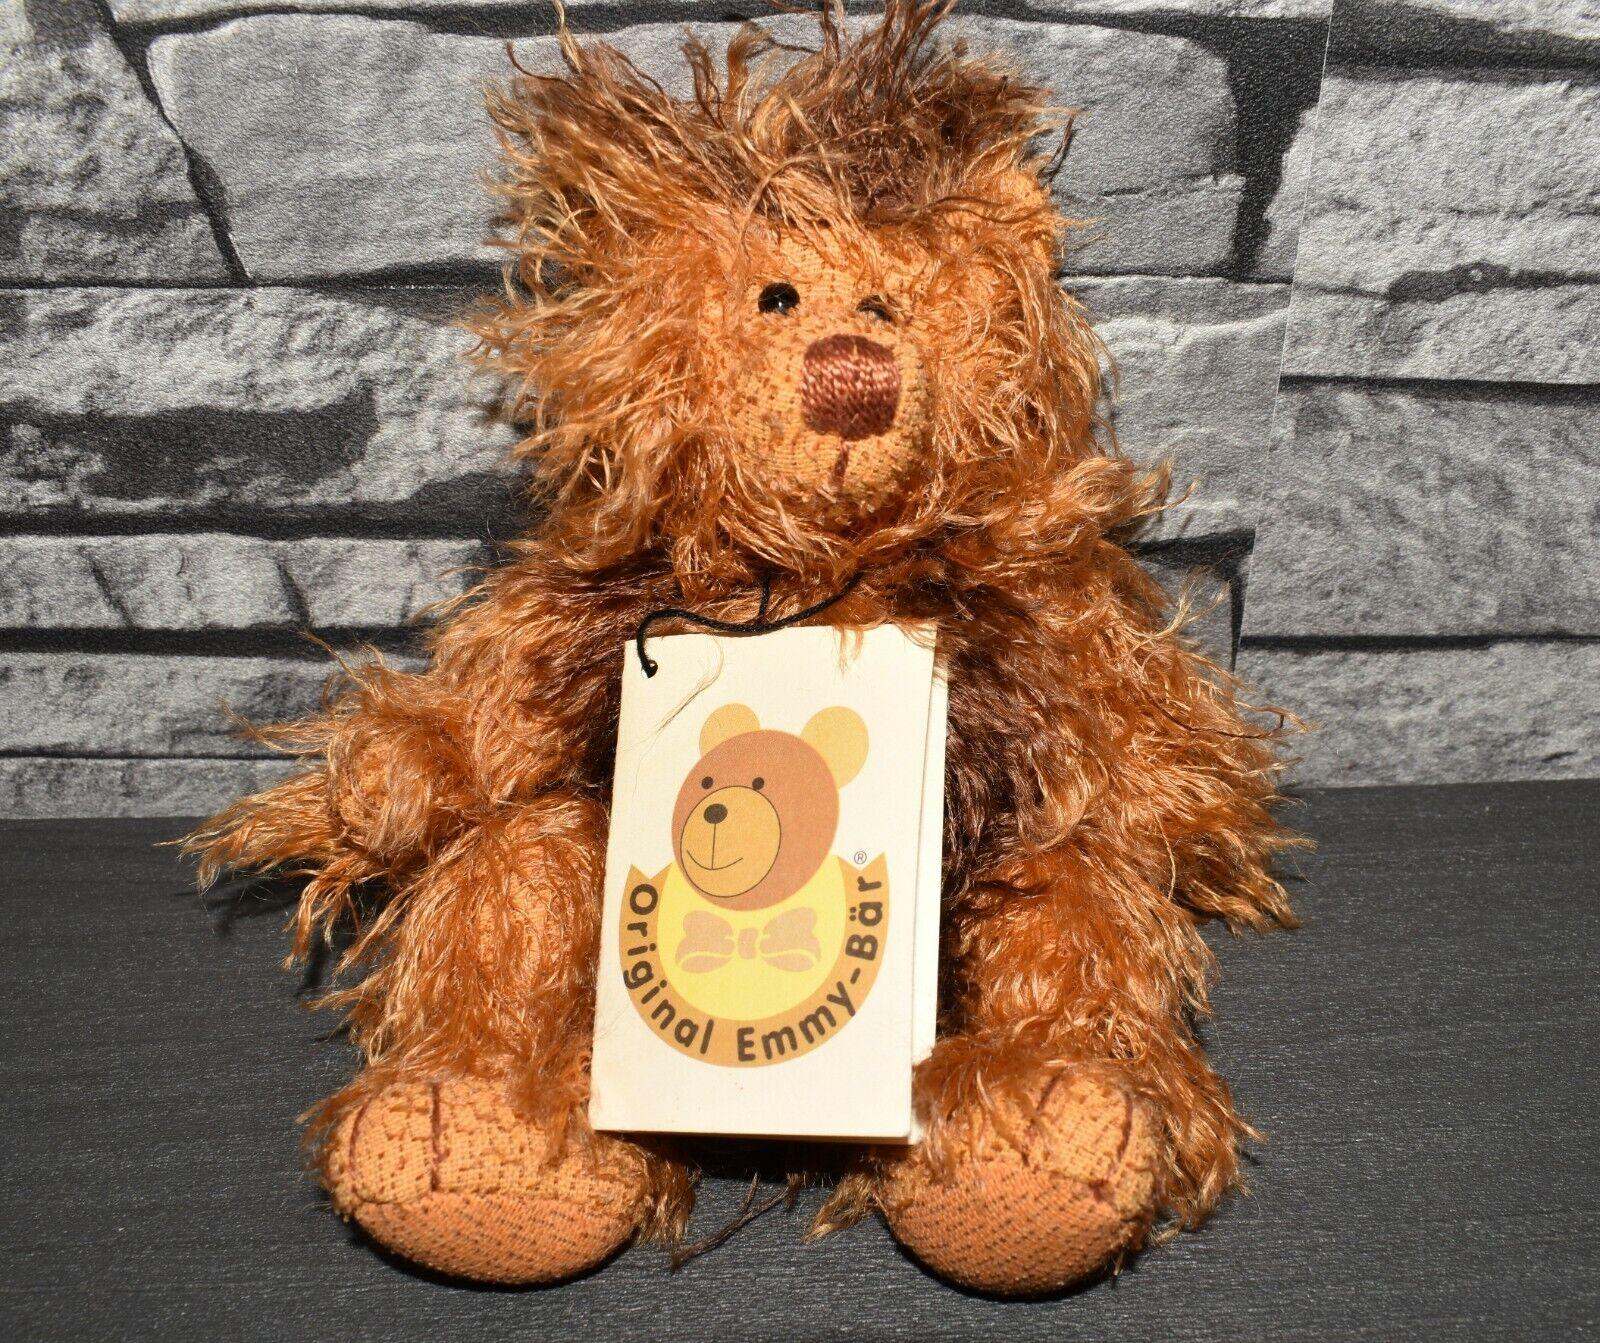 NEU Extrem Seltene Original Emmy Teddybär Teddy Alt Figur Limitiert Handarbeit